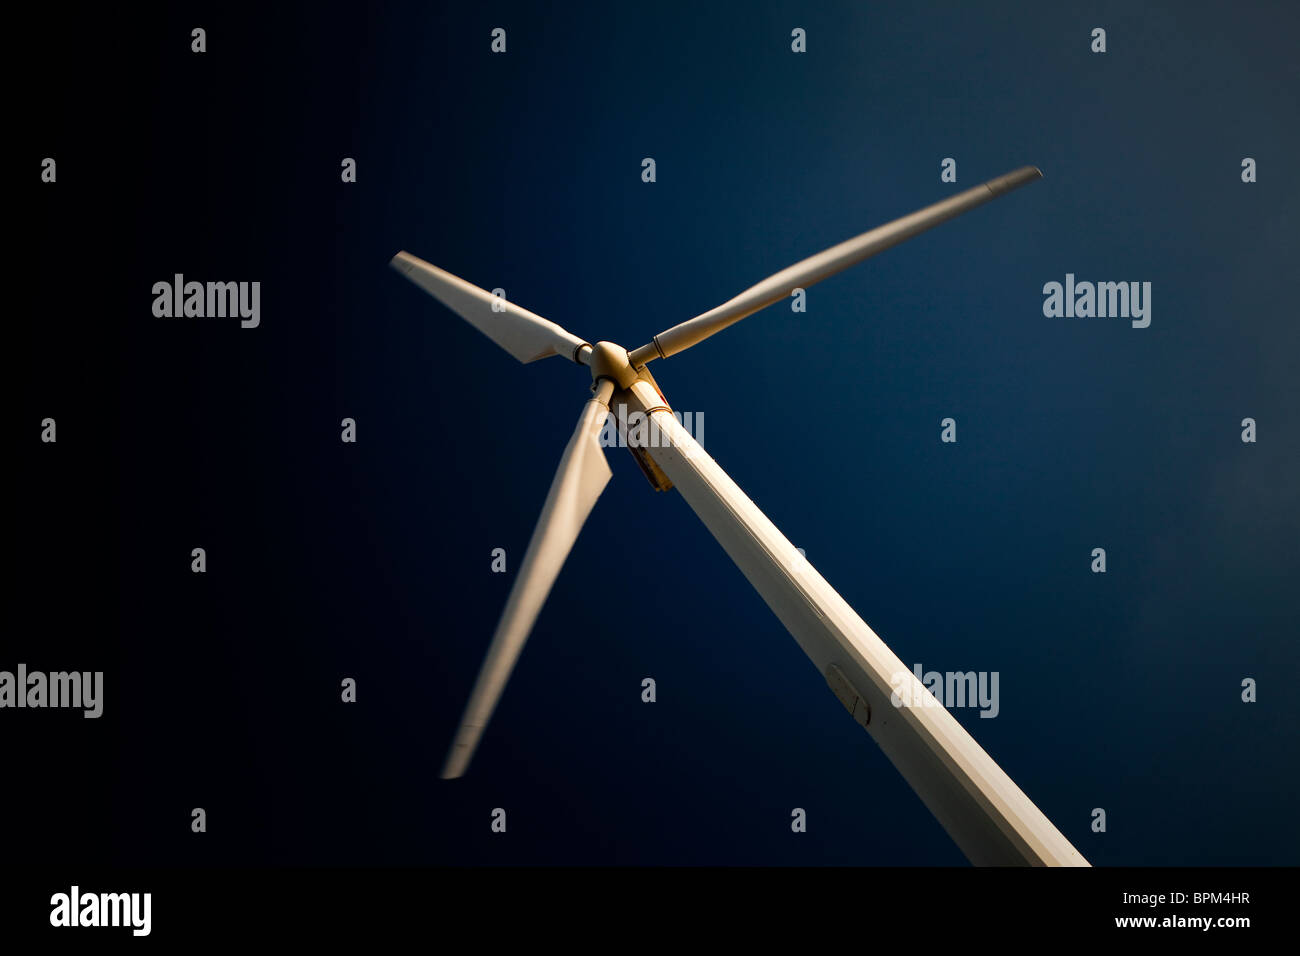 Modern Wind Turbine against blue sky - Stock Image